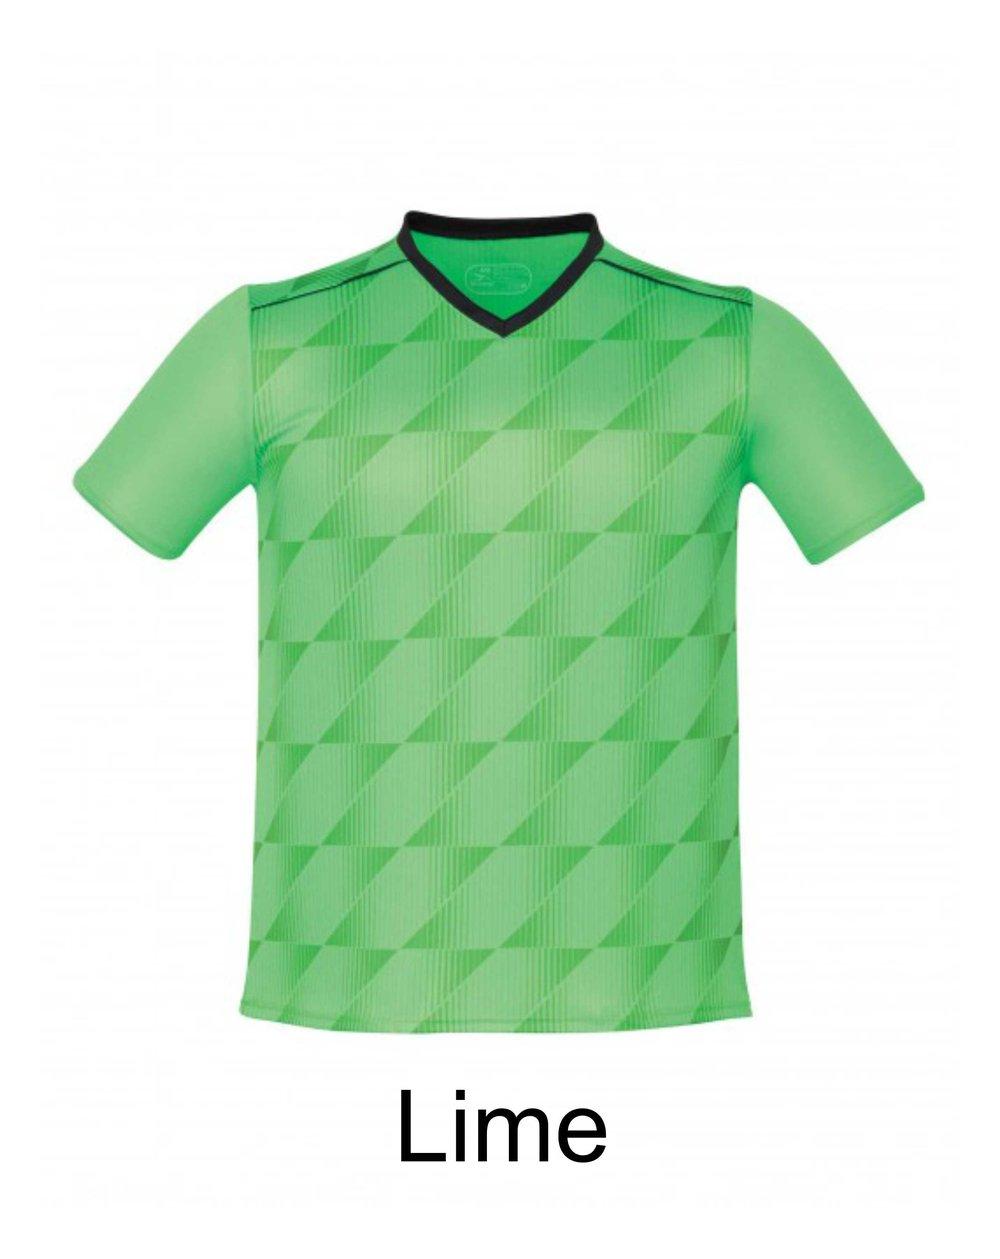 Lim-Blk w Name.jpg